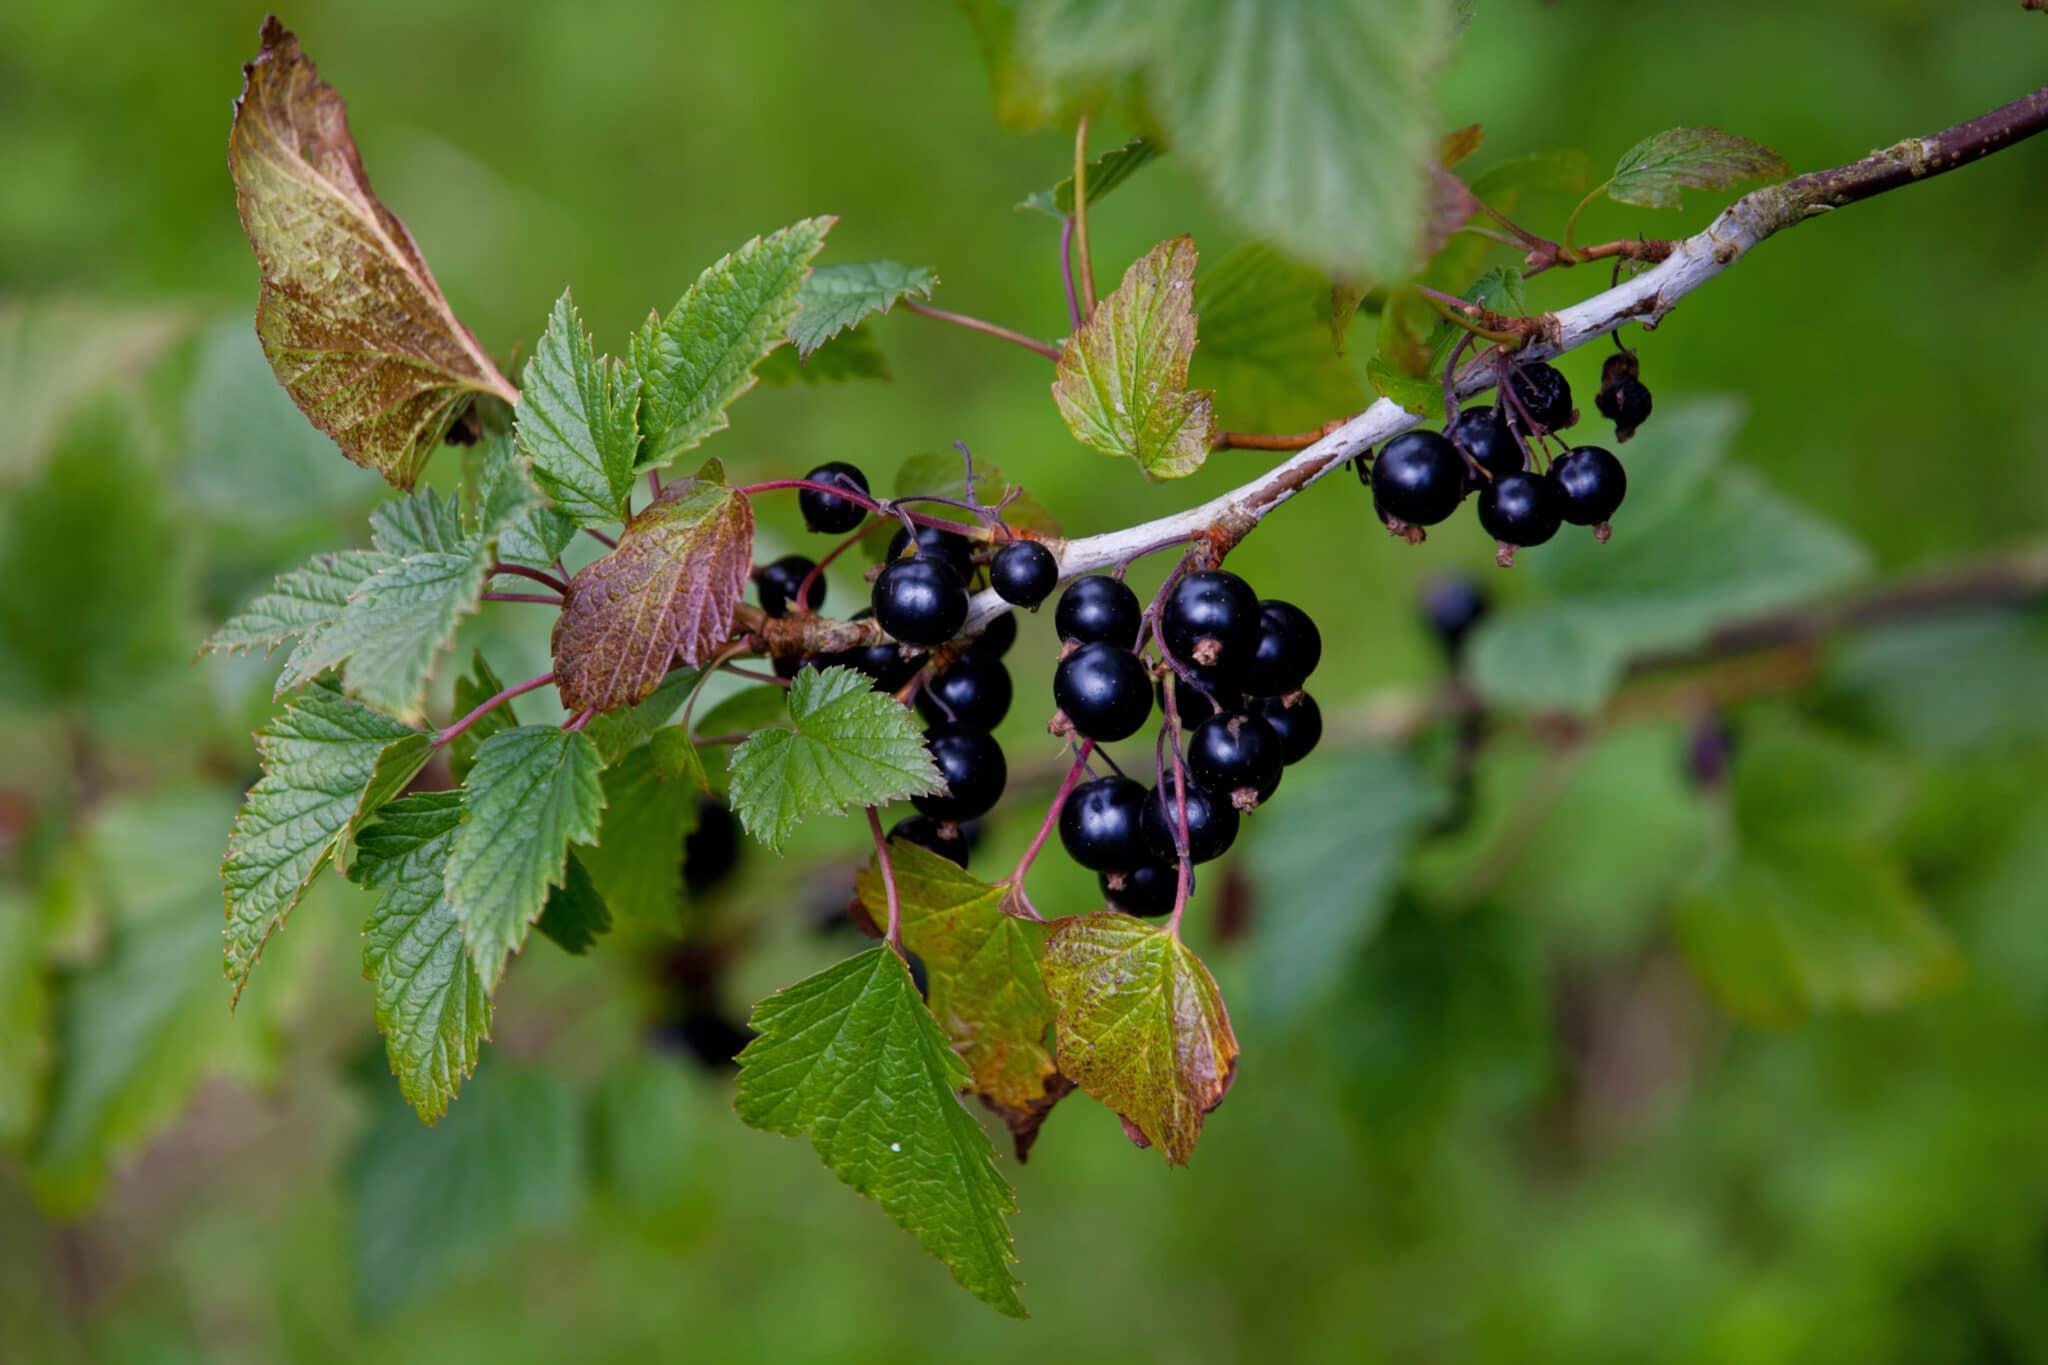 The Health Benefits of Blackcurrants